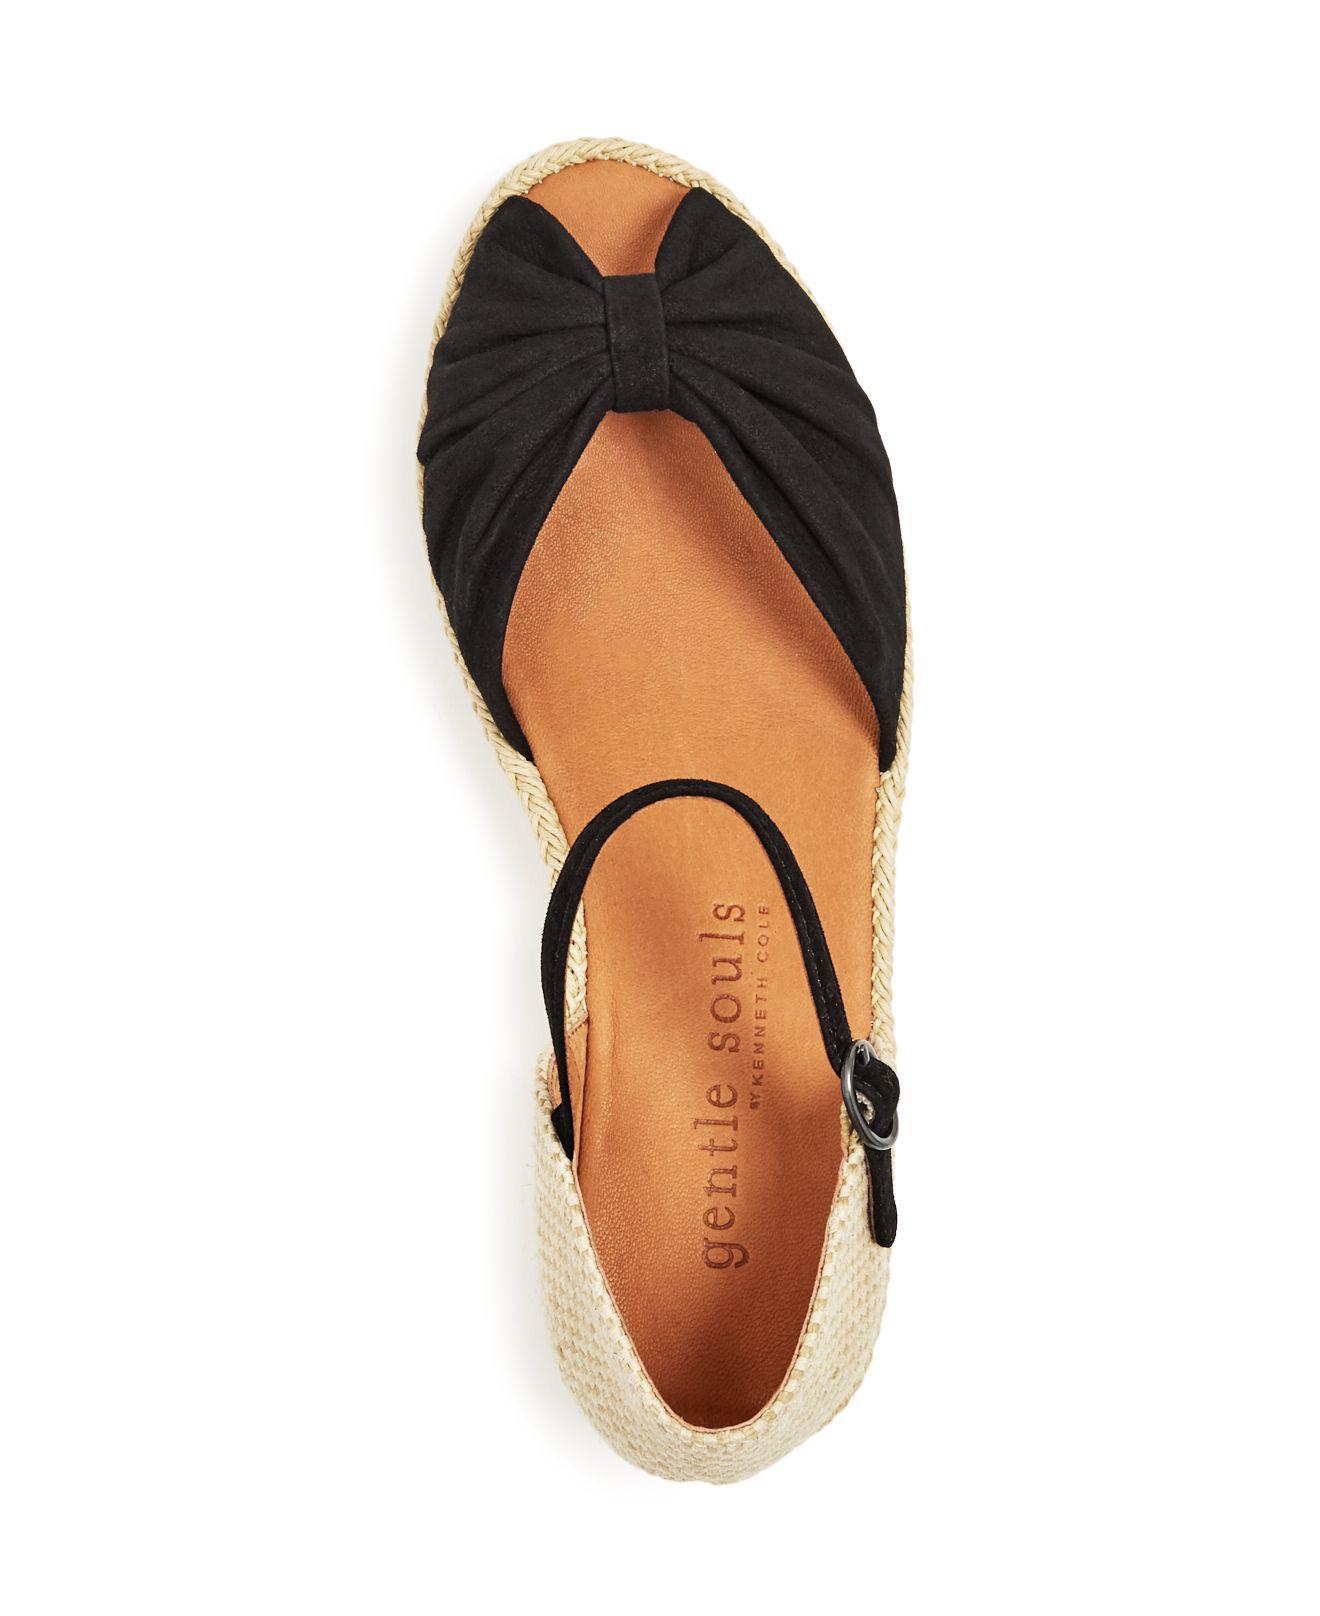 96434a35662 Gentle Souls Multicolor Women's Lucille Suede Demi Wedge Espadrille Sandals